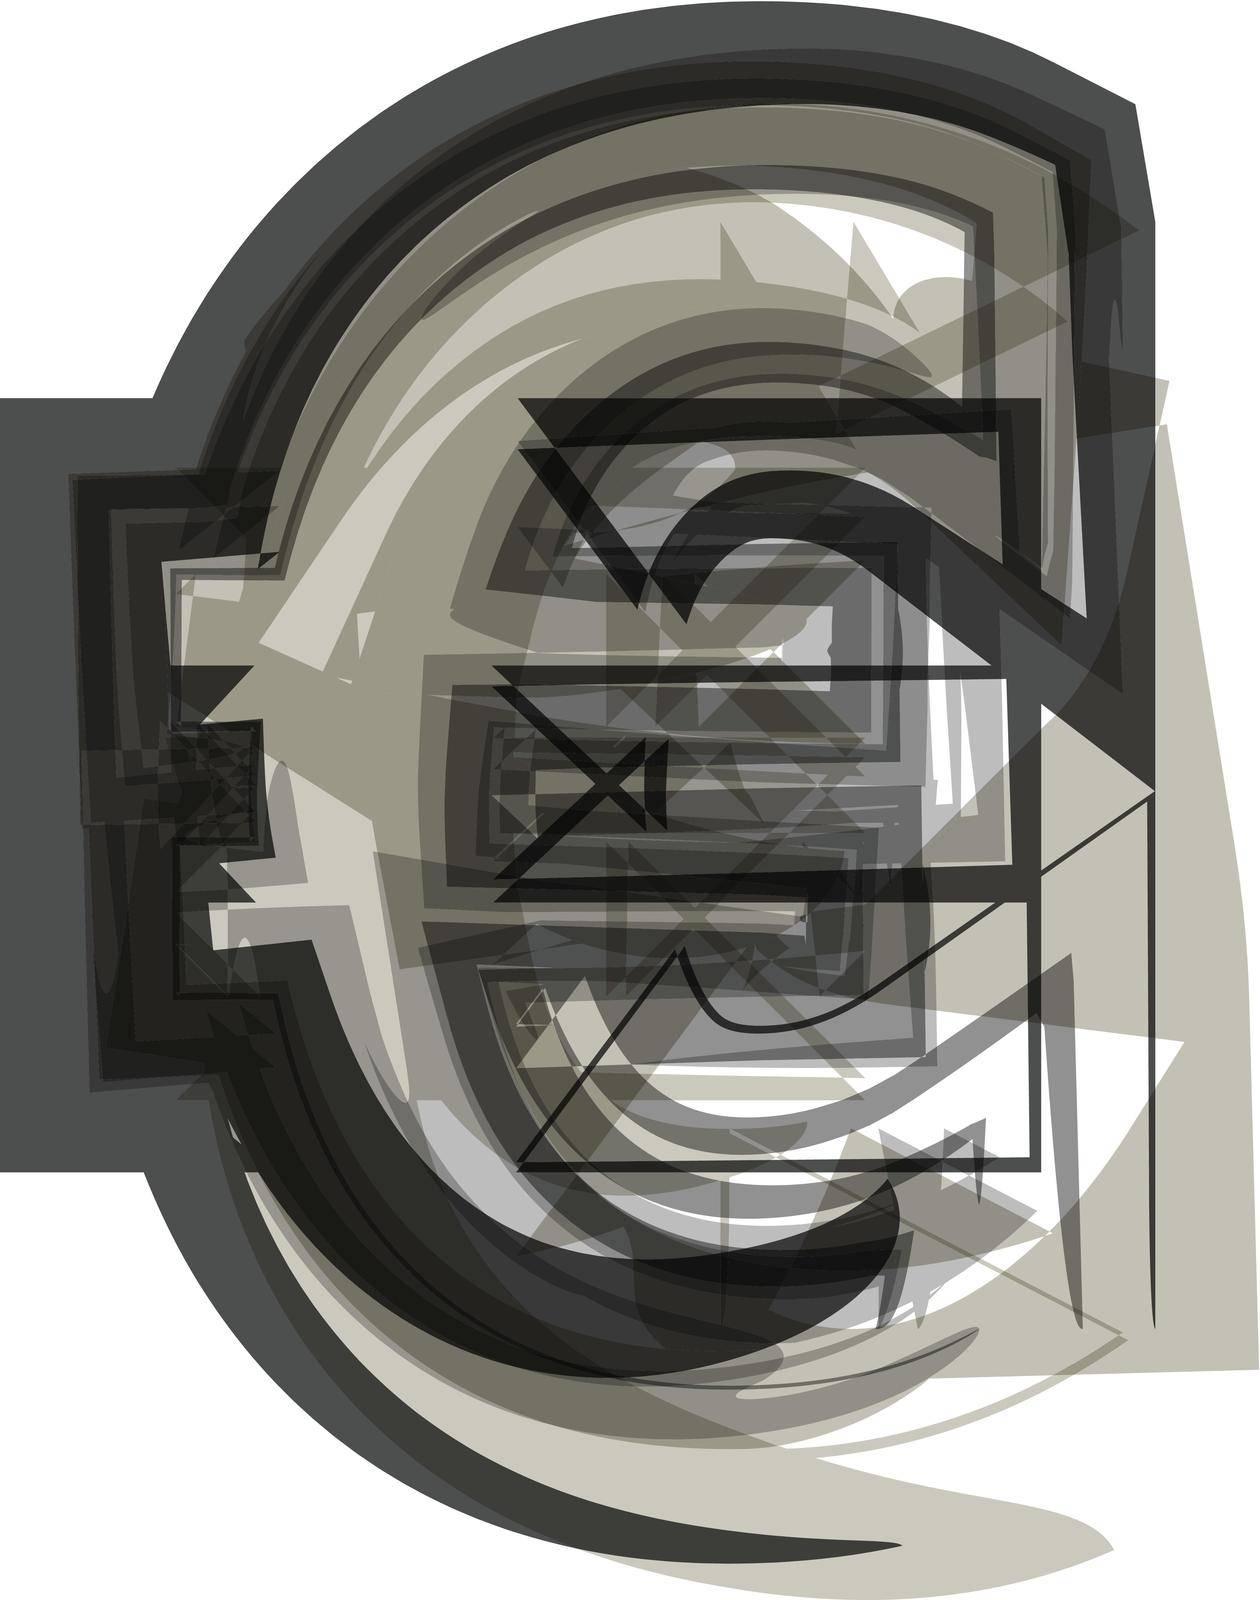 Abstract Euro Symbol illustration